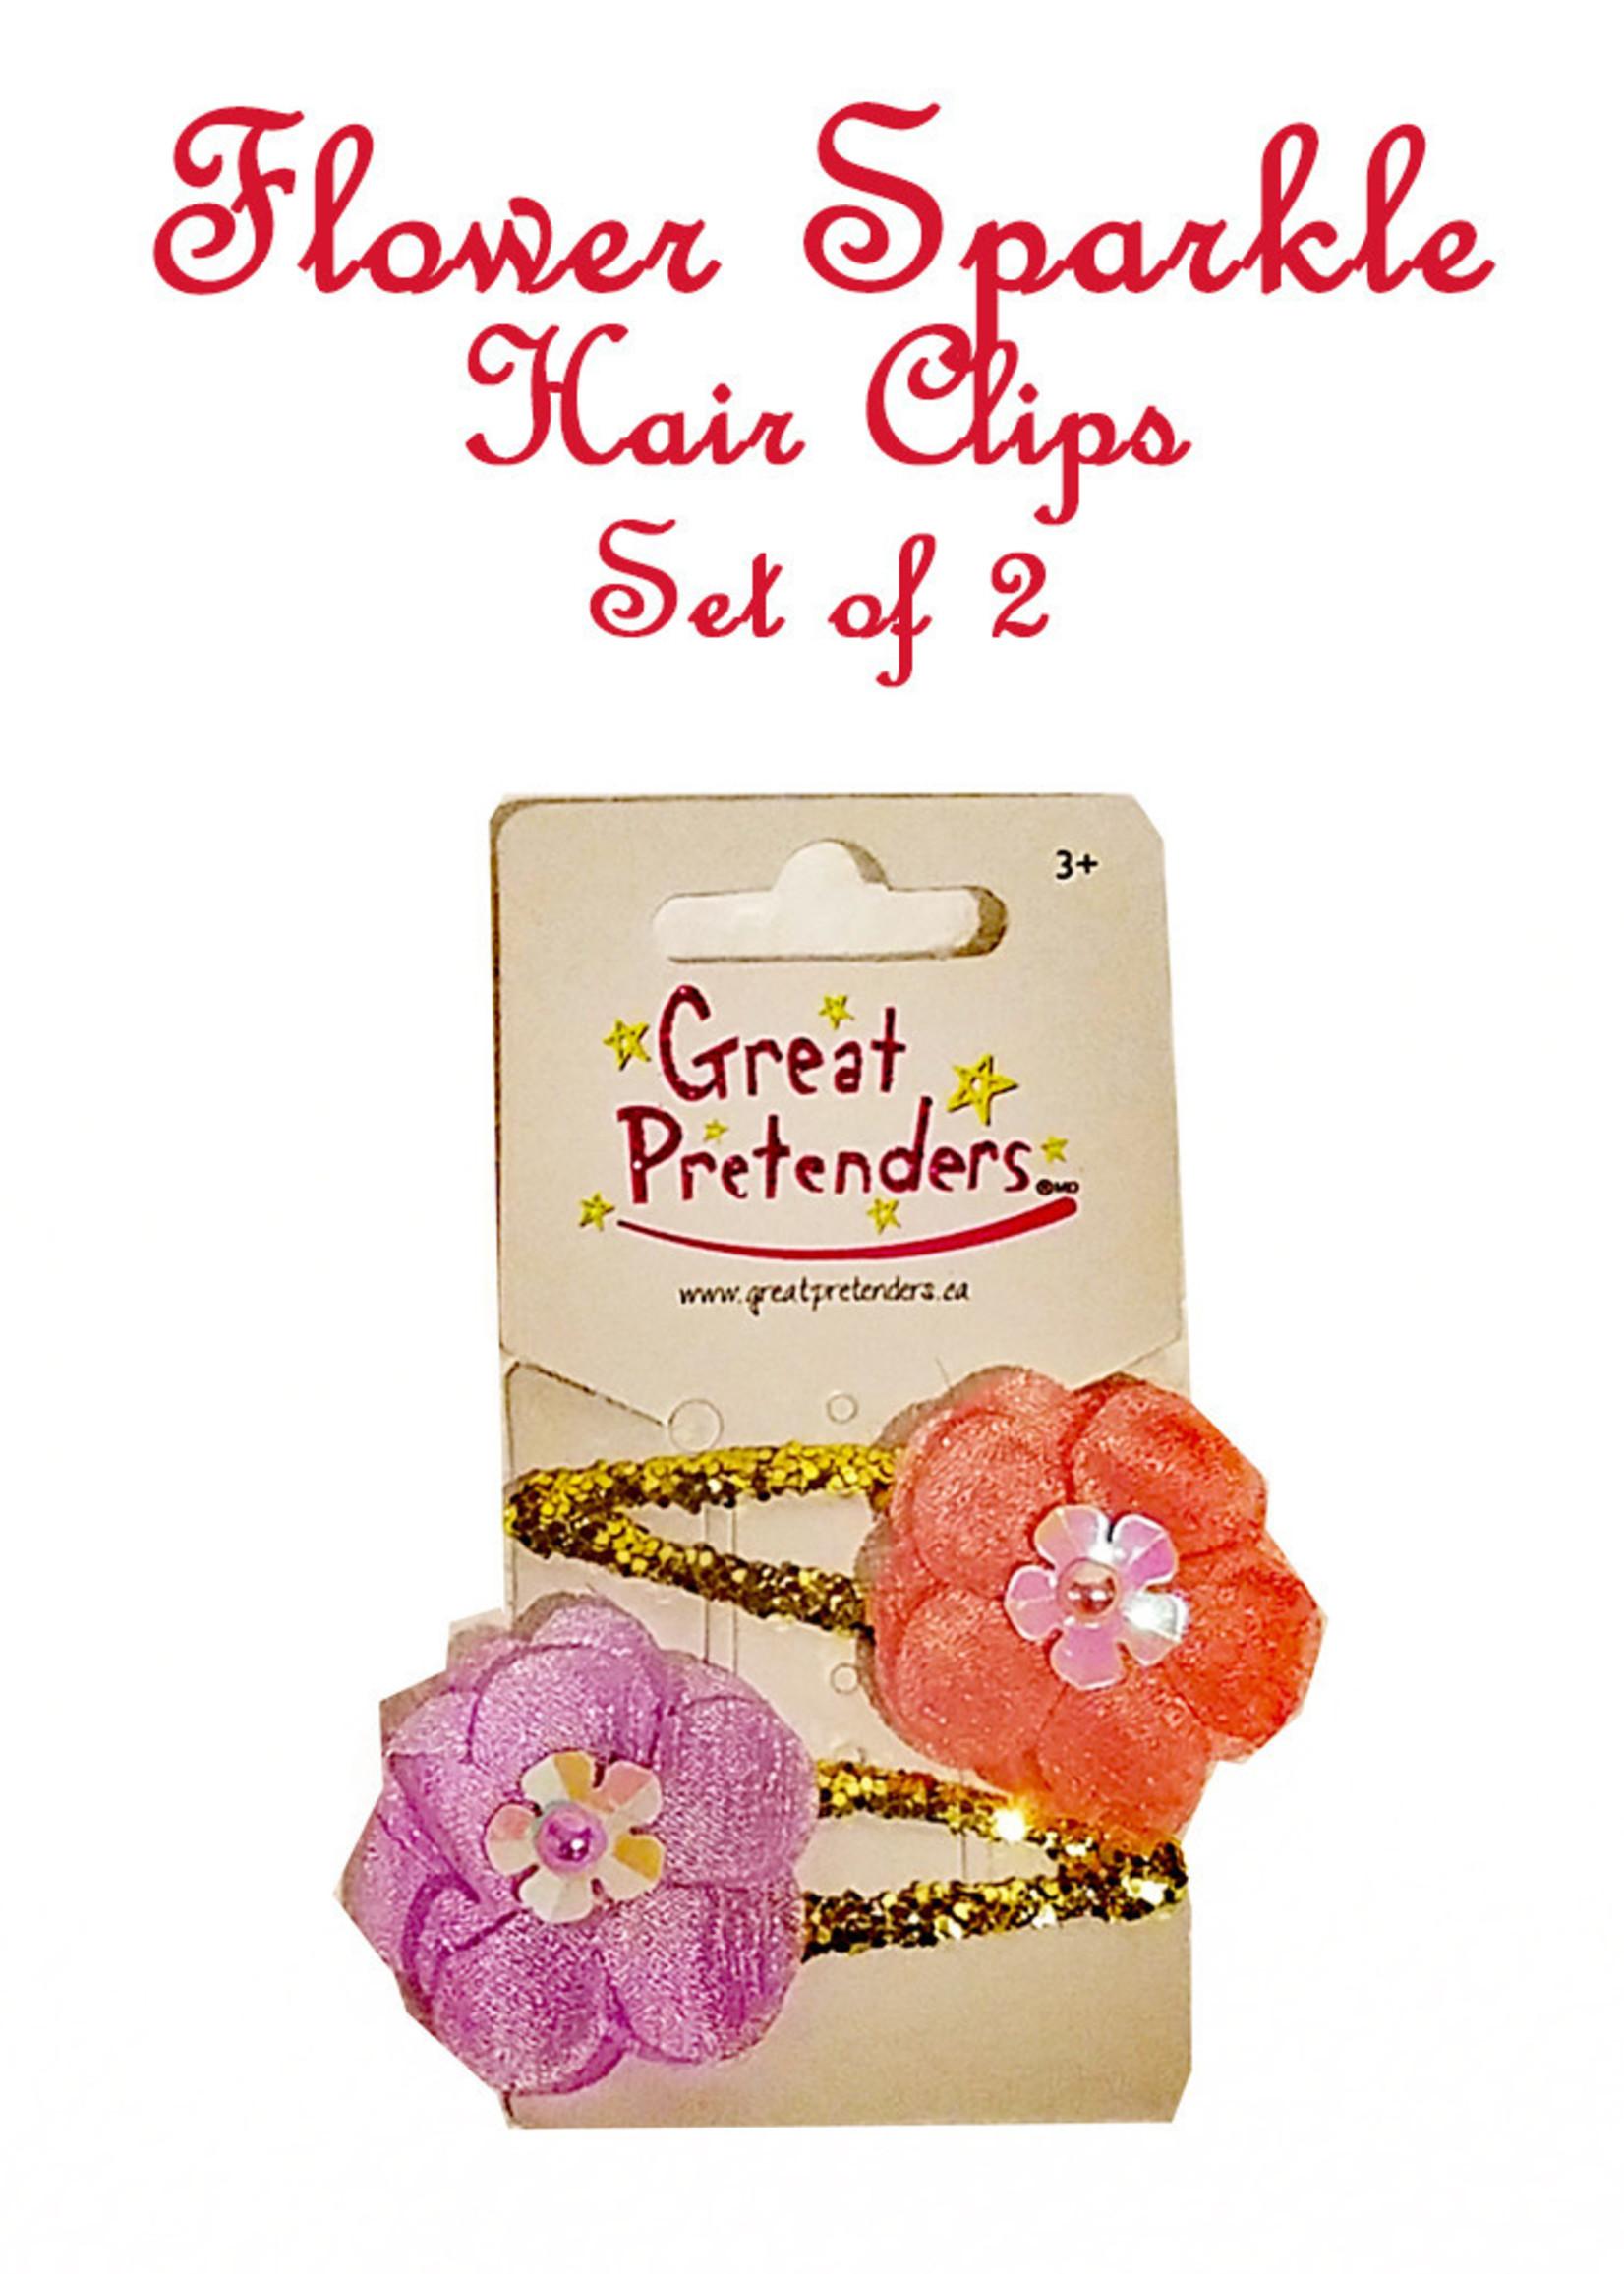 Great Pretenders Flower Sparkle Clips